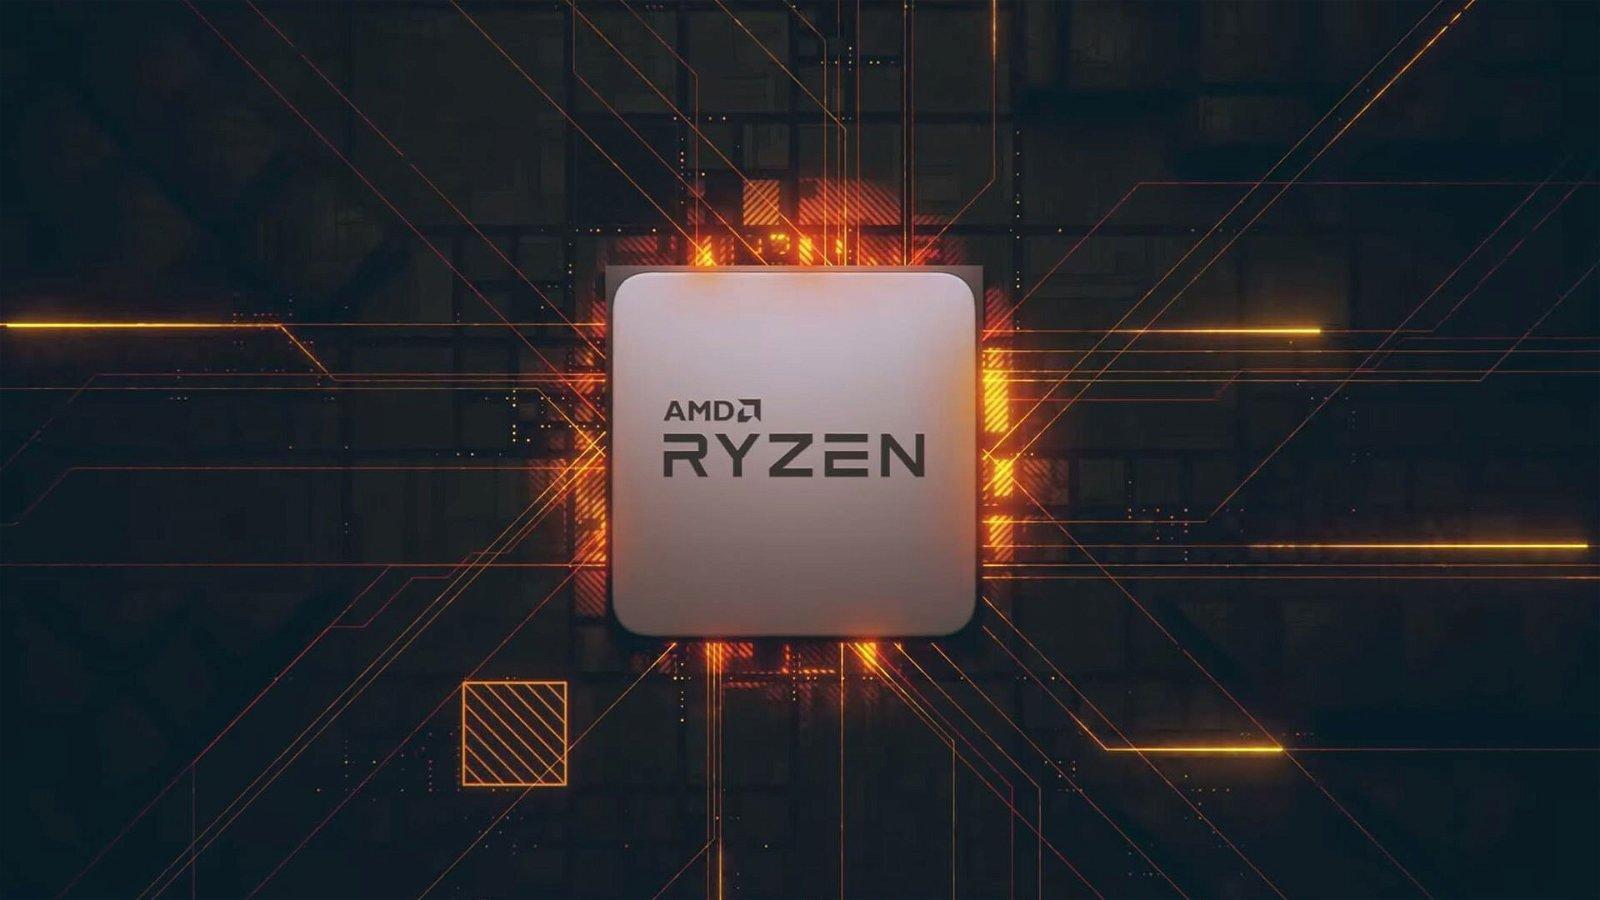 AMD Ryzen 7 3800X CPU Review 2